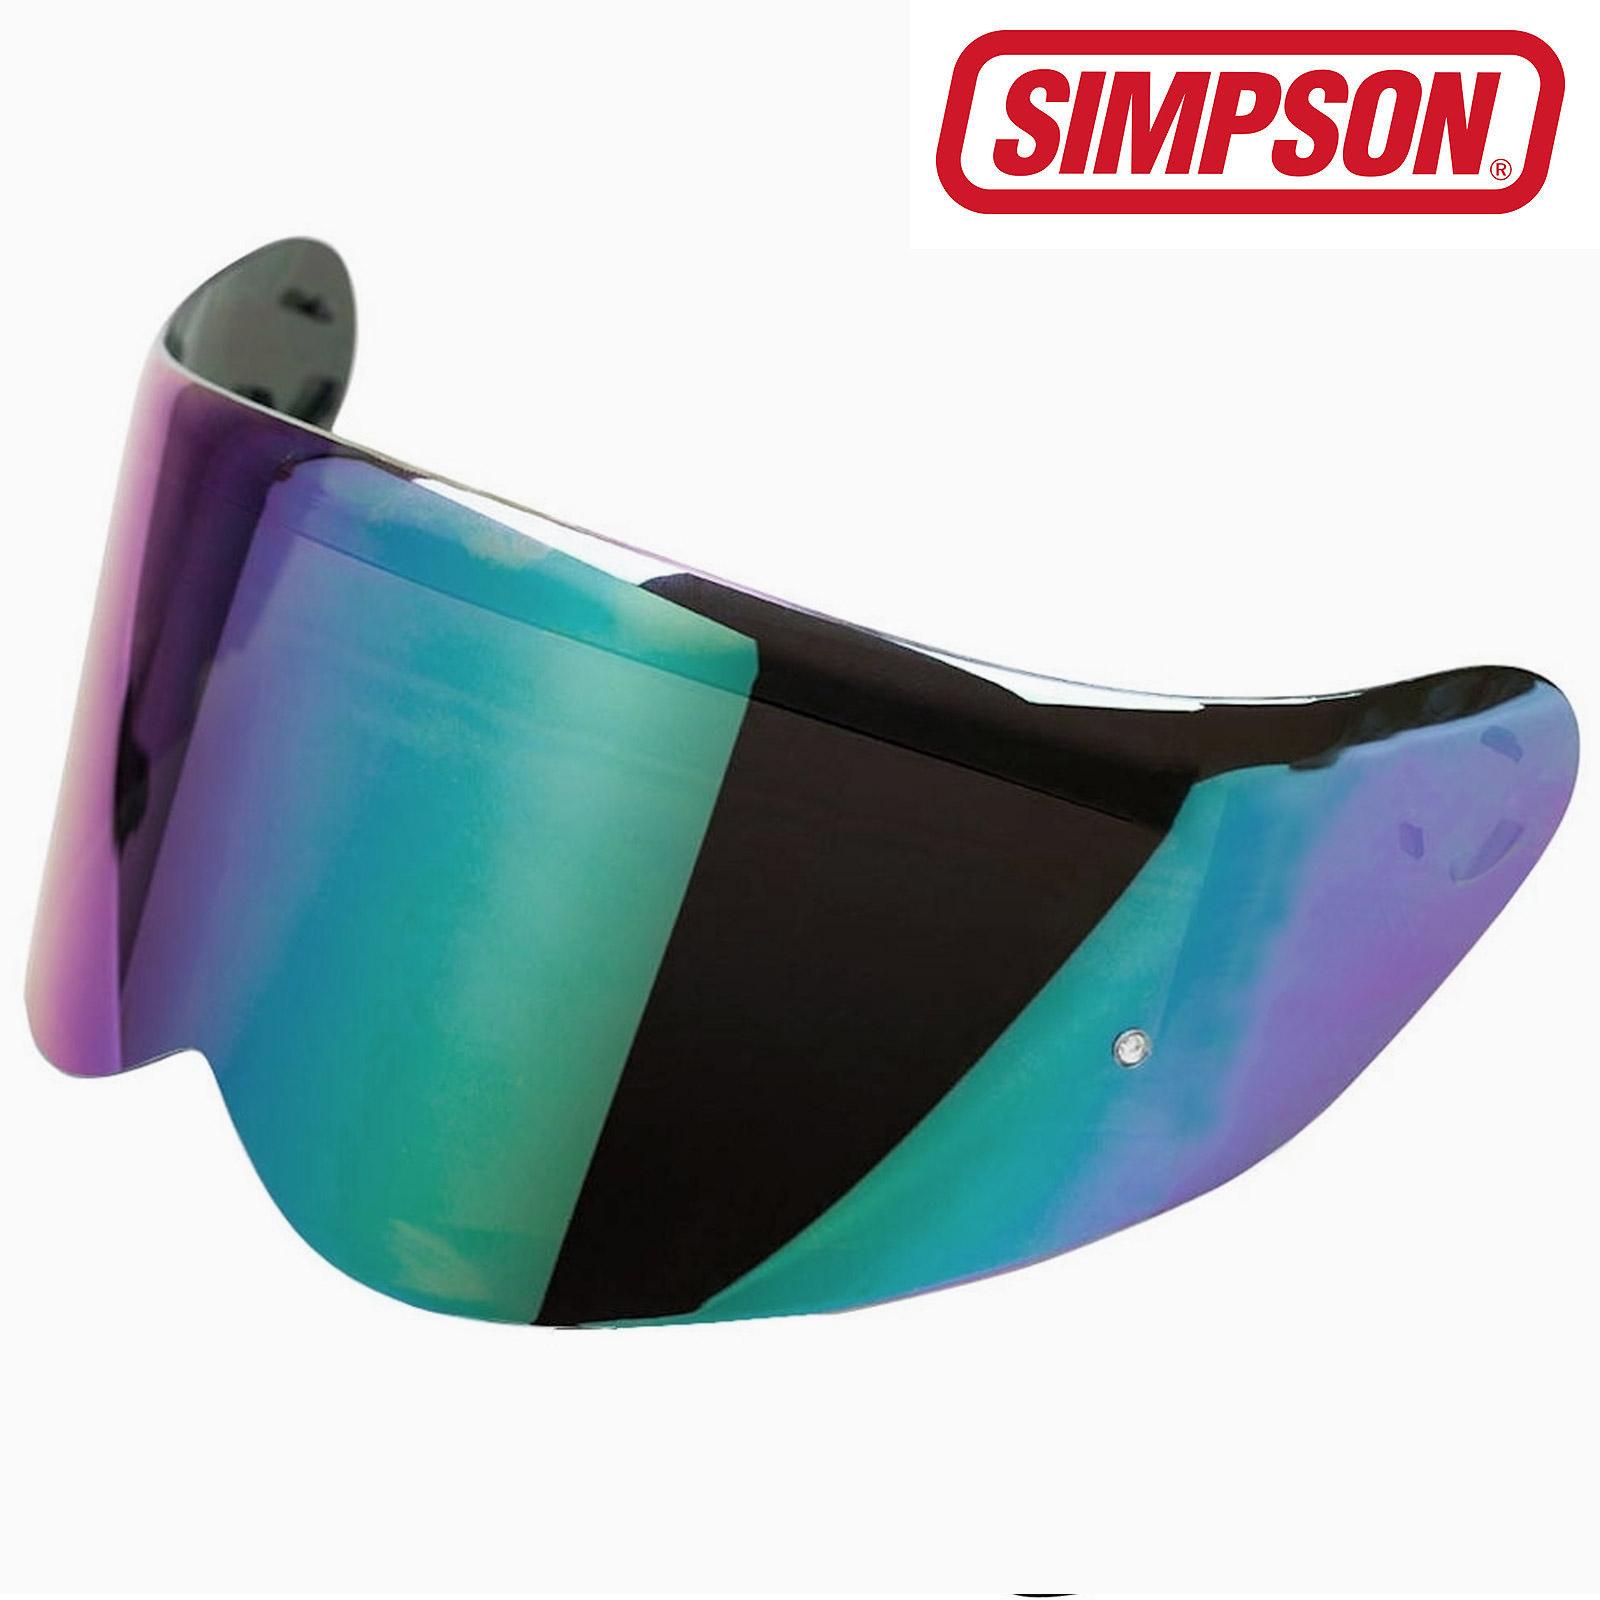 948fca93 Details about Simpson Venom Genuine Rainbow Iridium Tint Replacement Visor  with Pin Lock Post